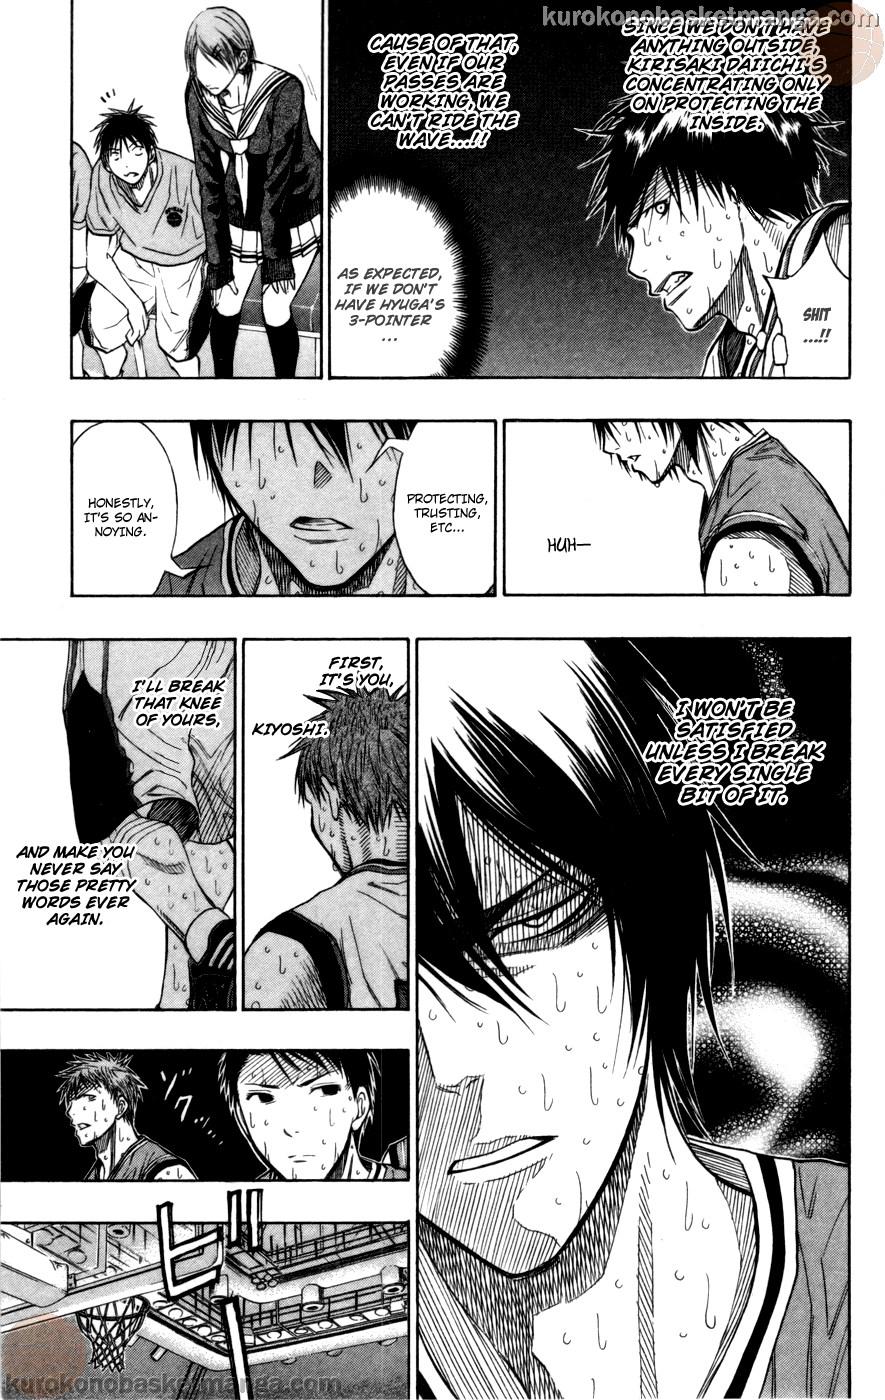 Kuroko no Basket Manga Chapter 105 - Image 17